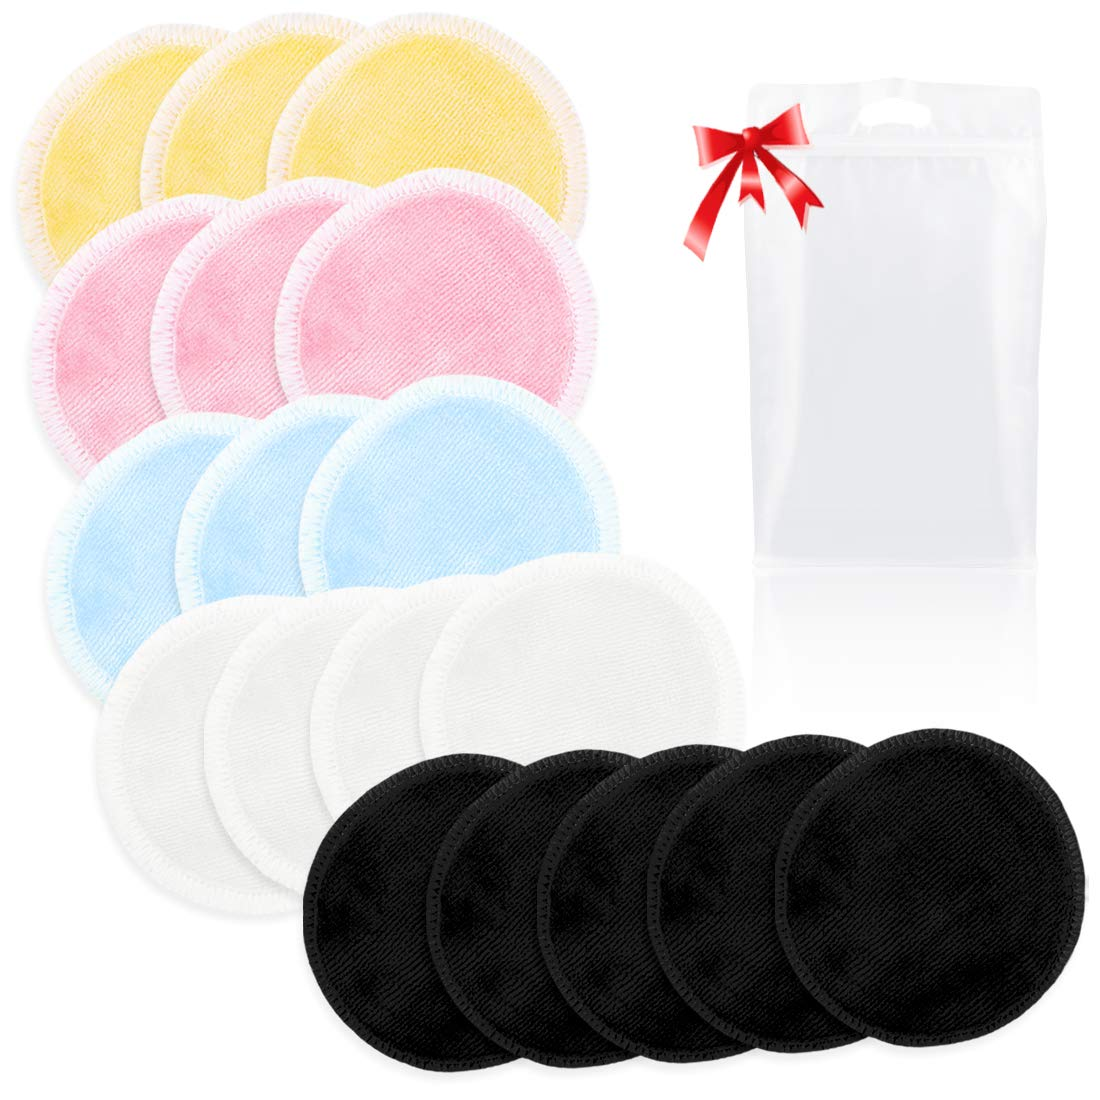 Kalevel 18pcs Organic Cotton Rounds Reusable Makeup Remover Pads Bamboo Toner Pads Washable Makeup Cloth Wipes Natural Zero Waste Face Eye Makeup Remover Cloth Pads with Bag (Mixed Colors)